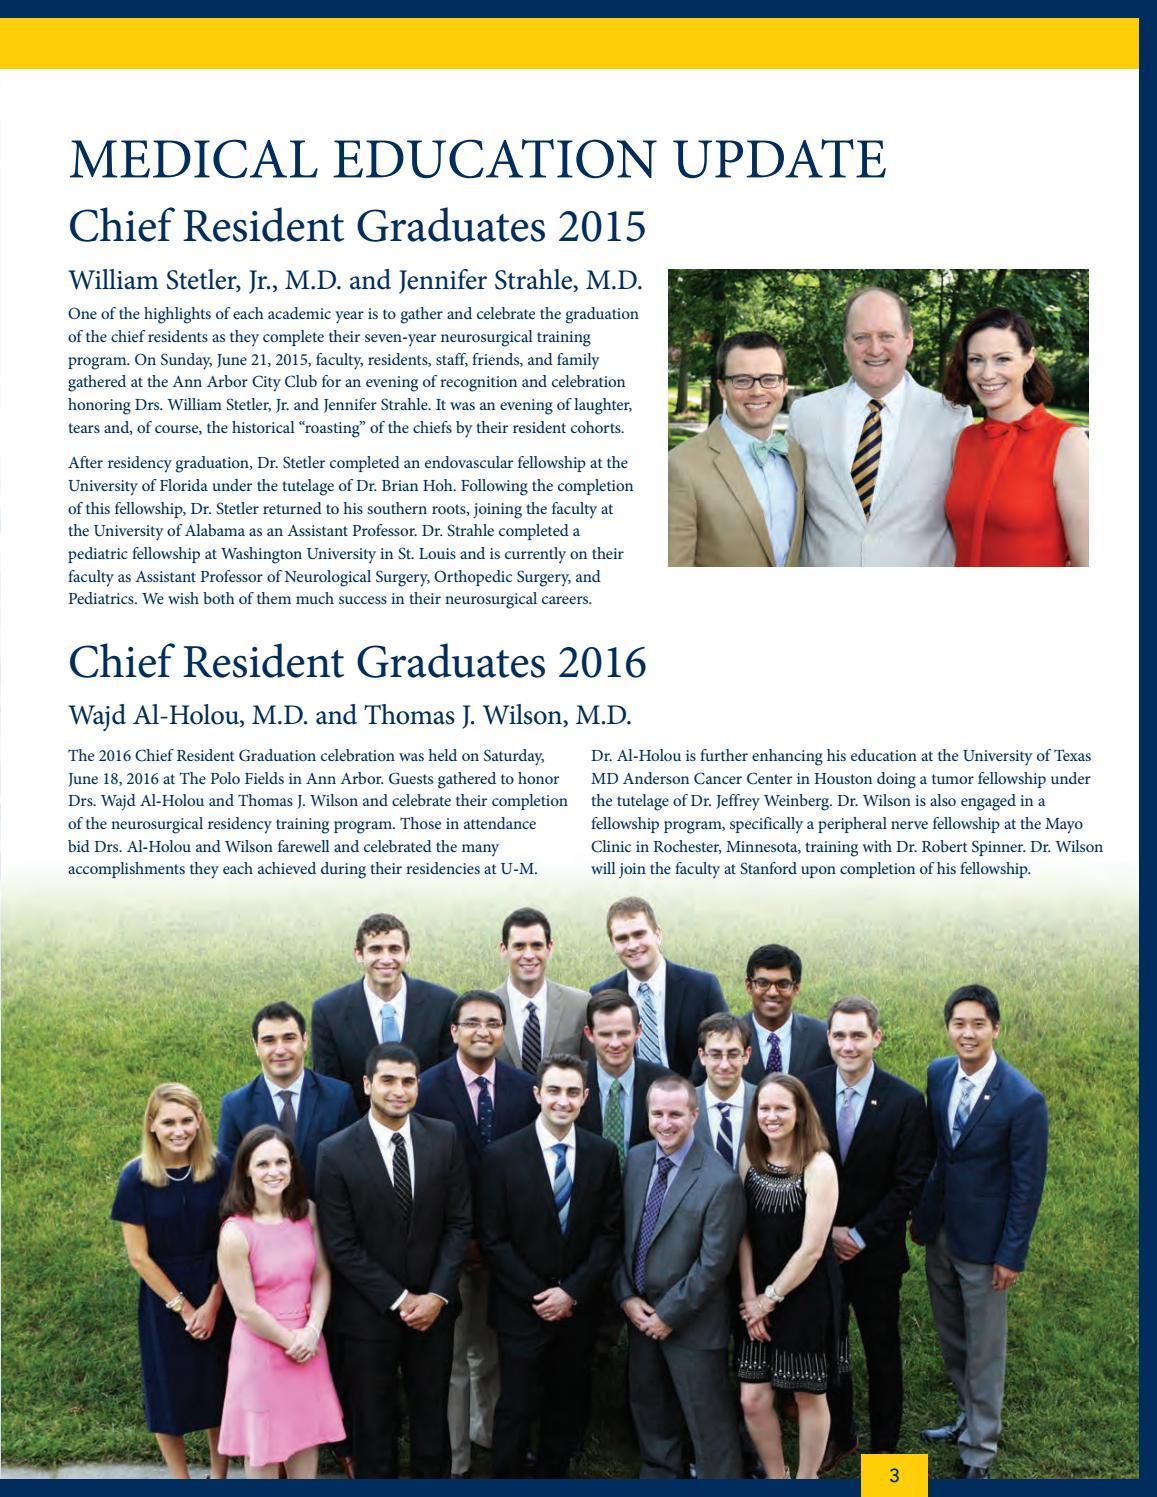 U-M Neurosurgery News and Notes 2016 by Michigan Medicine - issuu